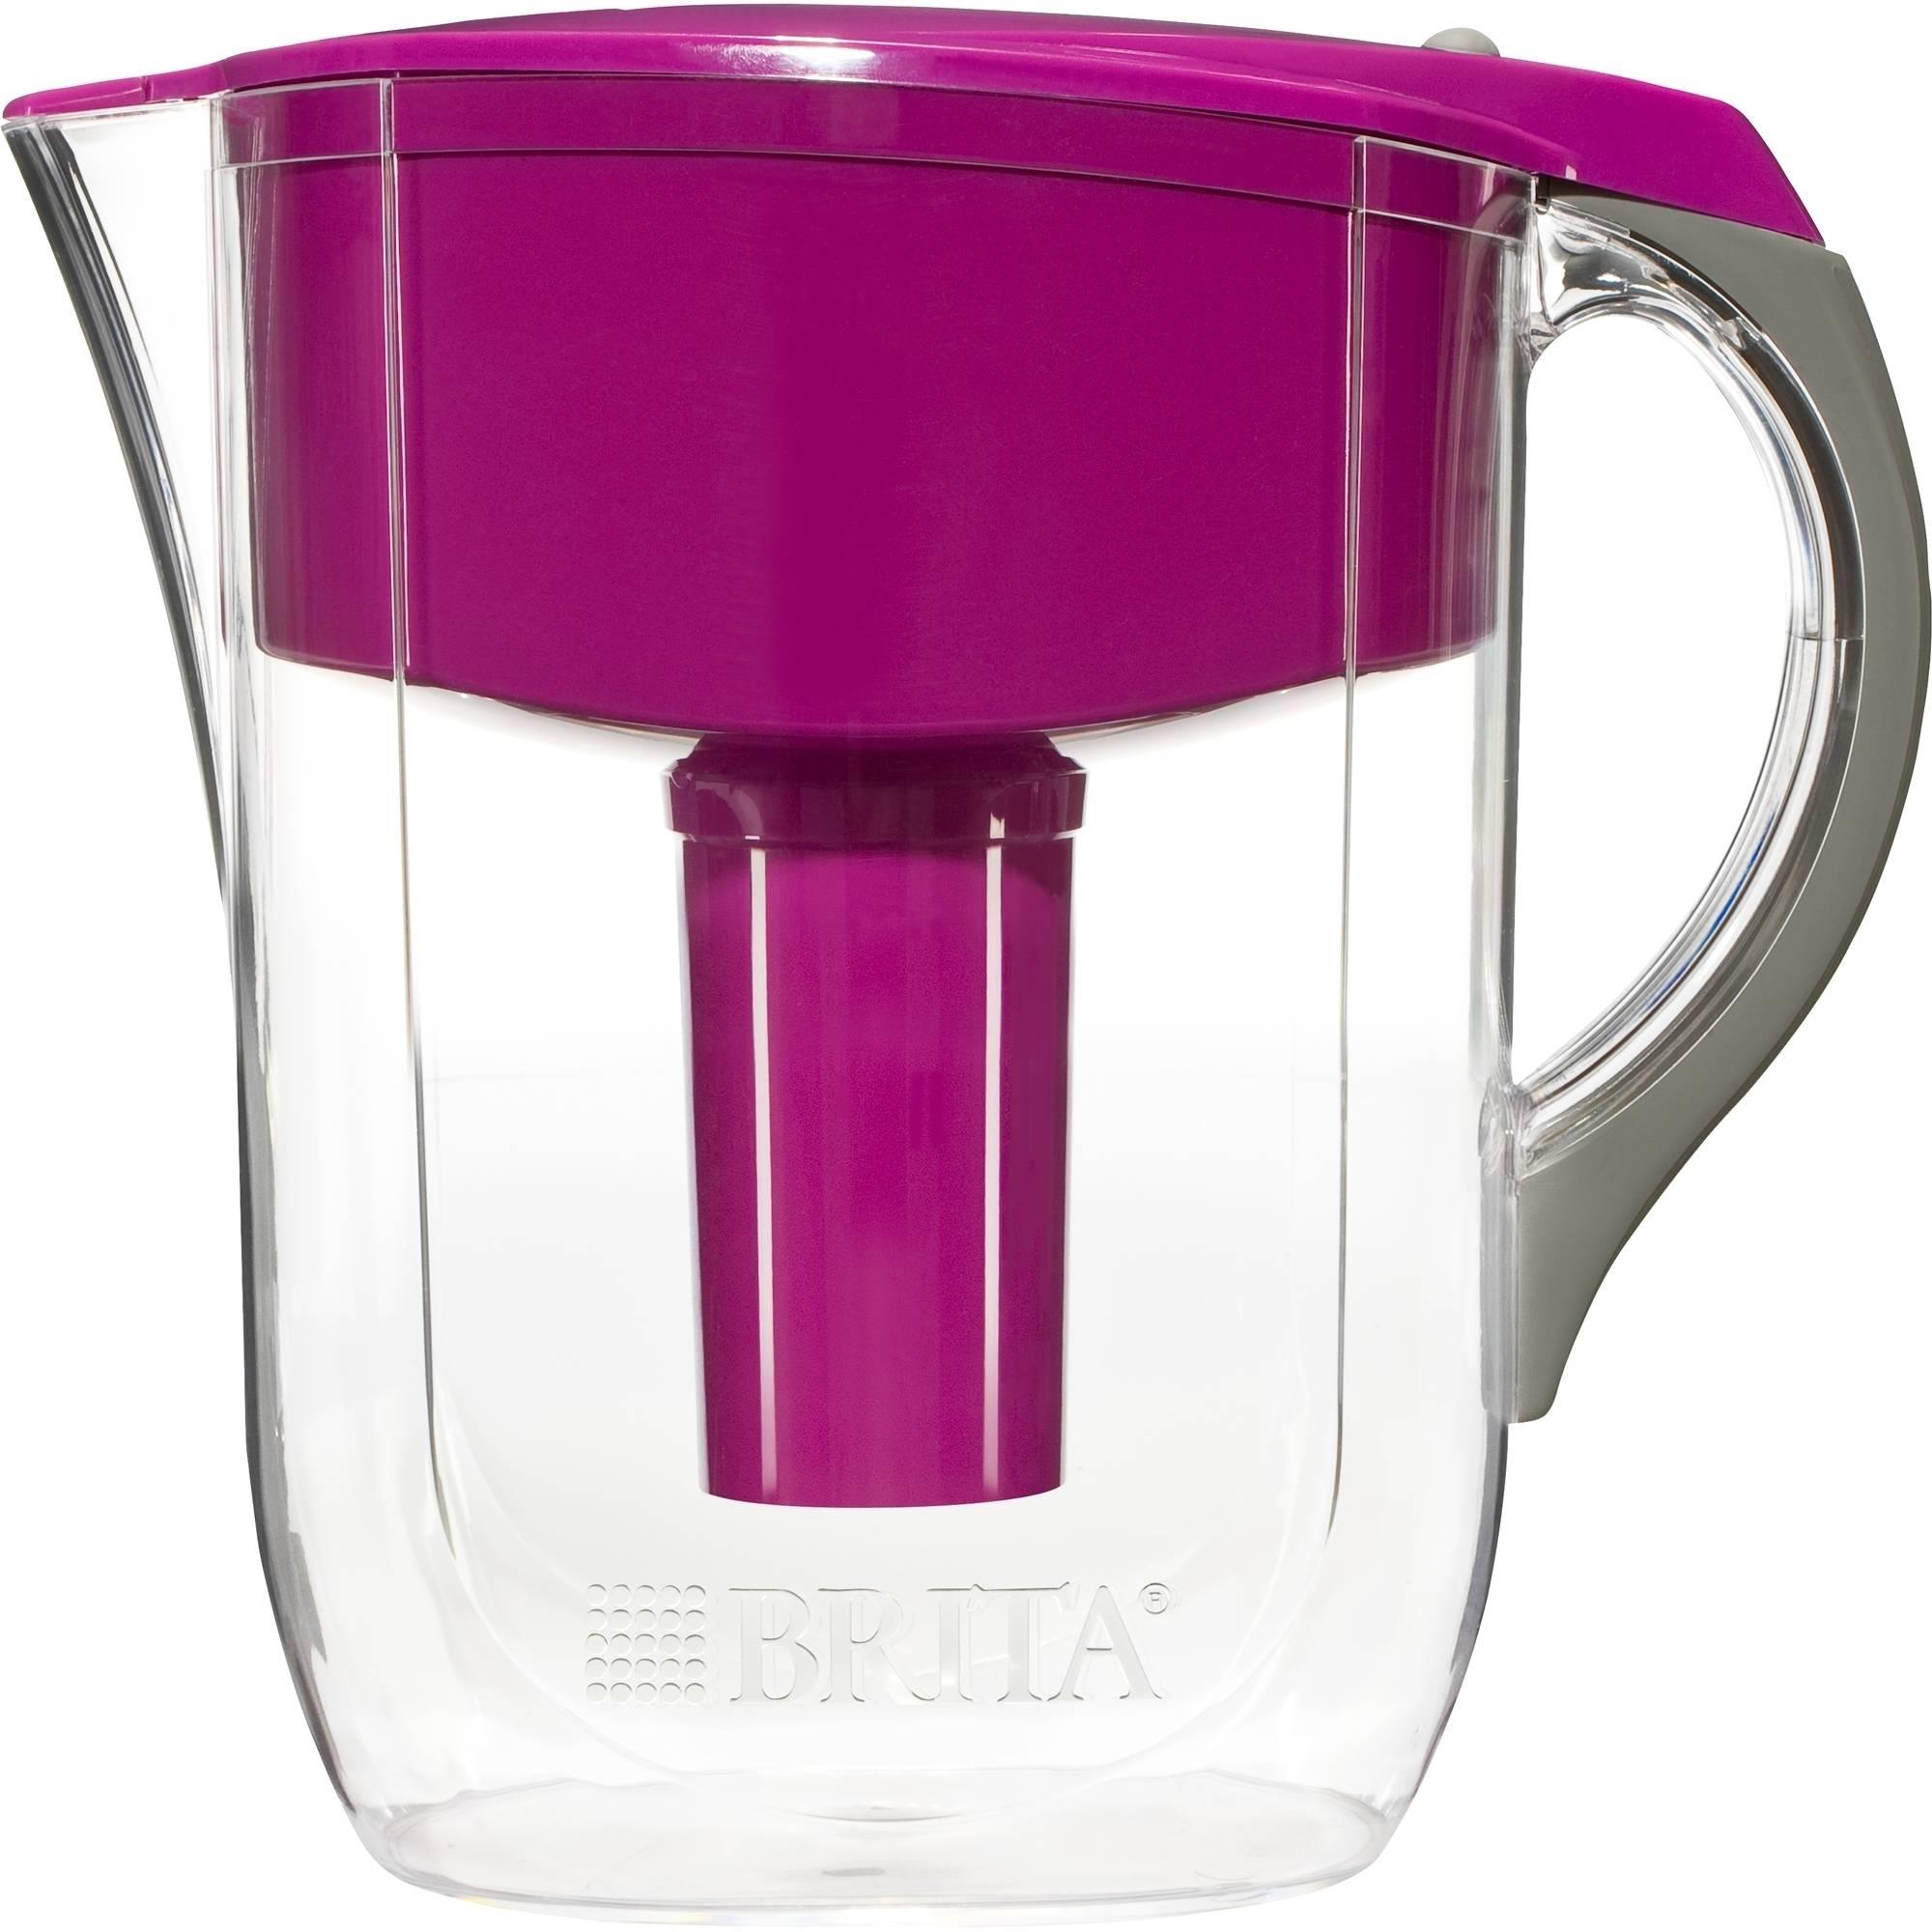 Brita Grand Water Filtration Pitcher, Violet, BPA Free